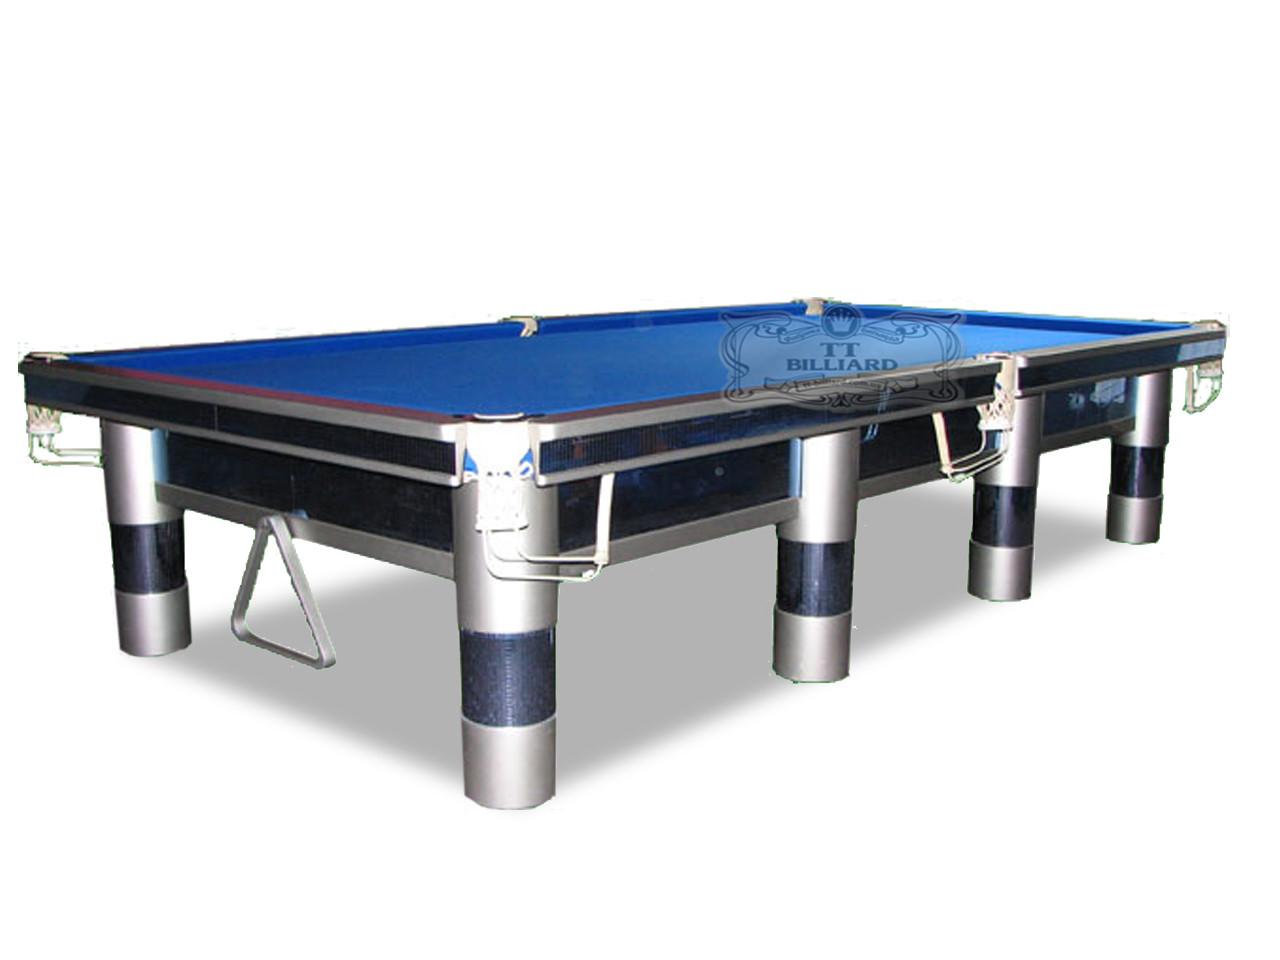 Бильярдный стол для пирамиды ХАЙТЕК 10ф ардезия 2.8м х 1.4м